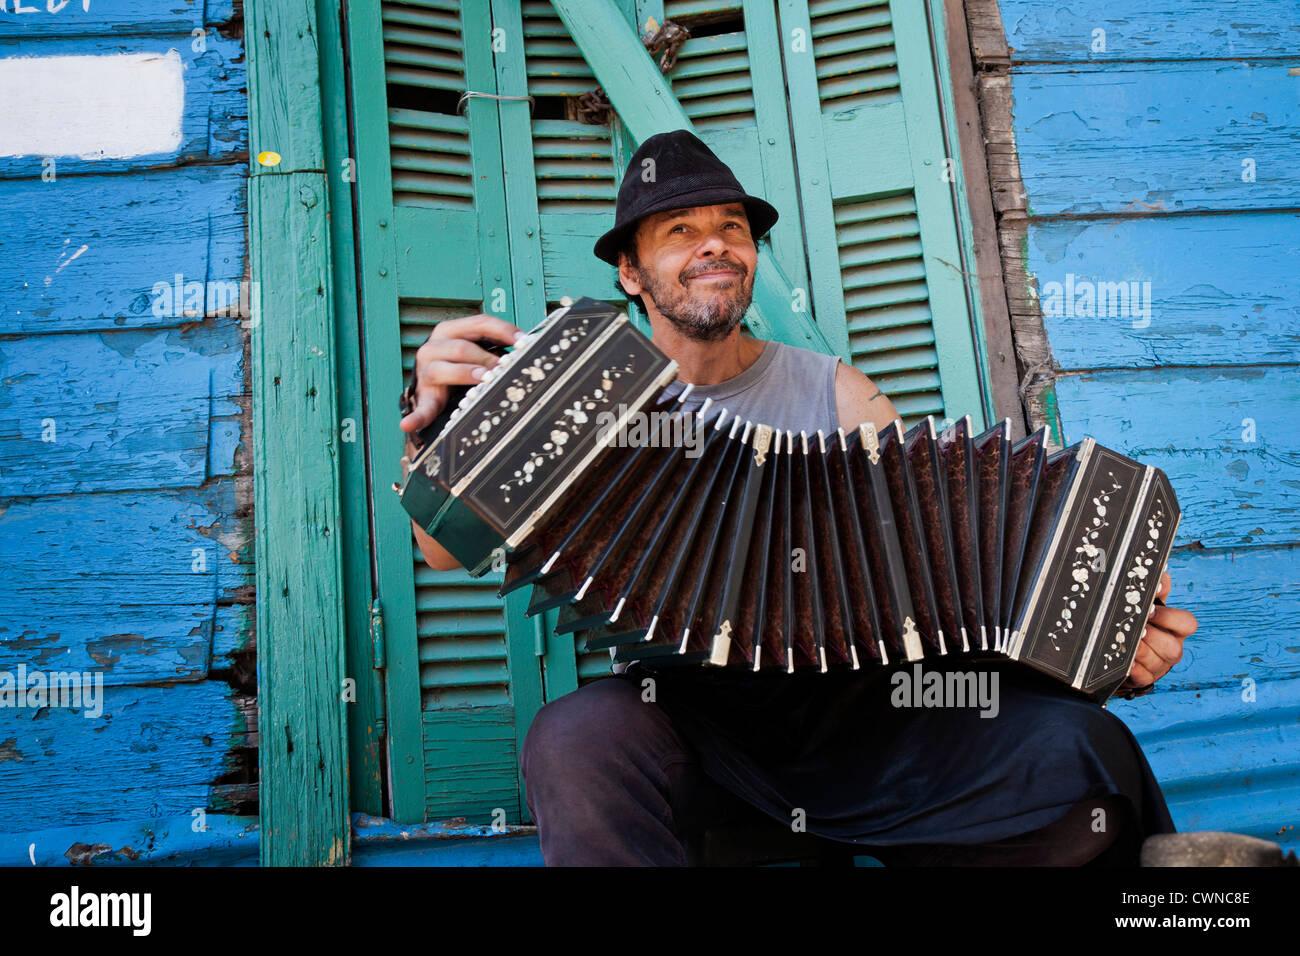 Musicien jouant le bandeon Caminito à salon à La Boca. Buenos Aires, Argentine Photo Stock